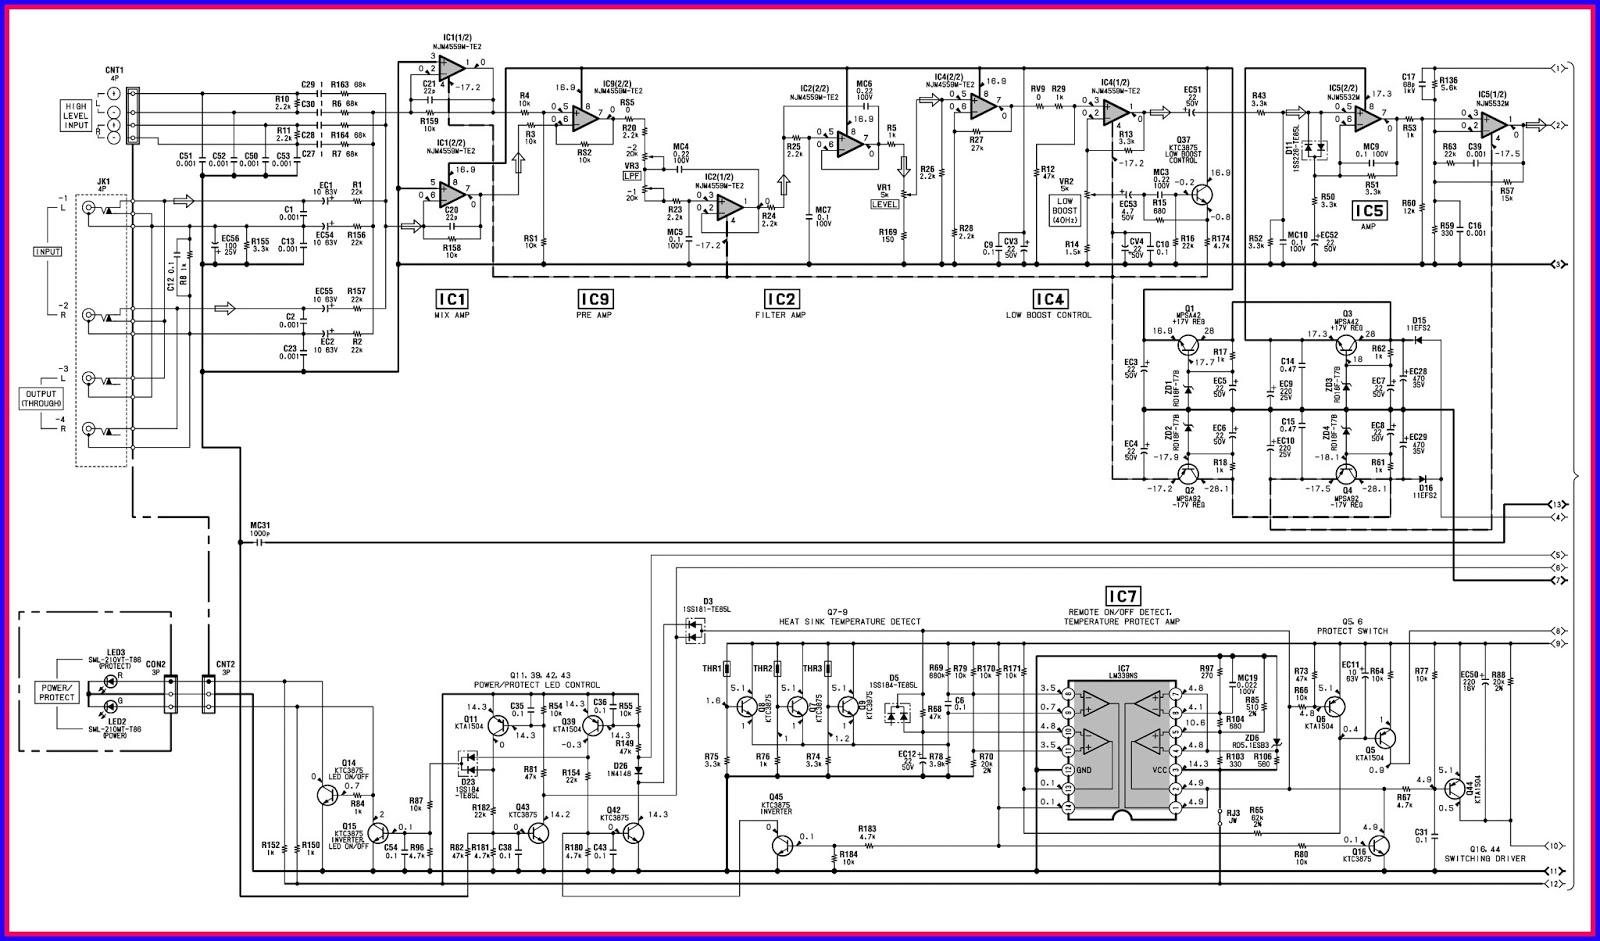 sony xplod amp wiring diagram 2002 north star engine 600 watt 38